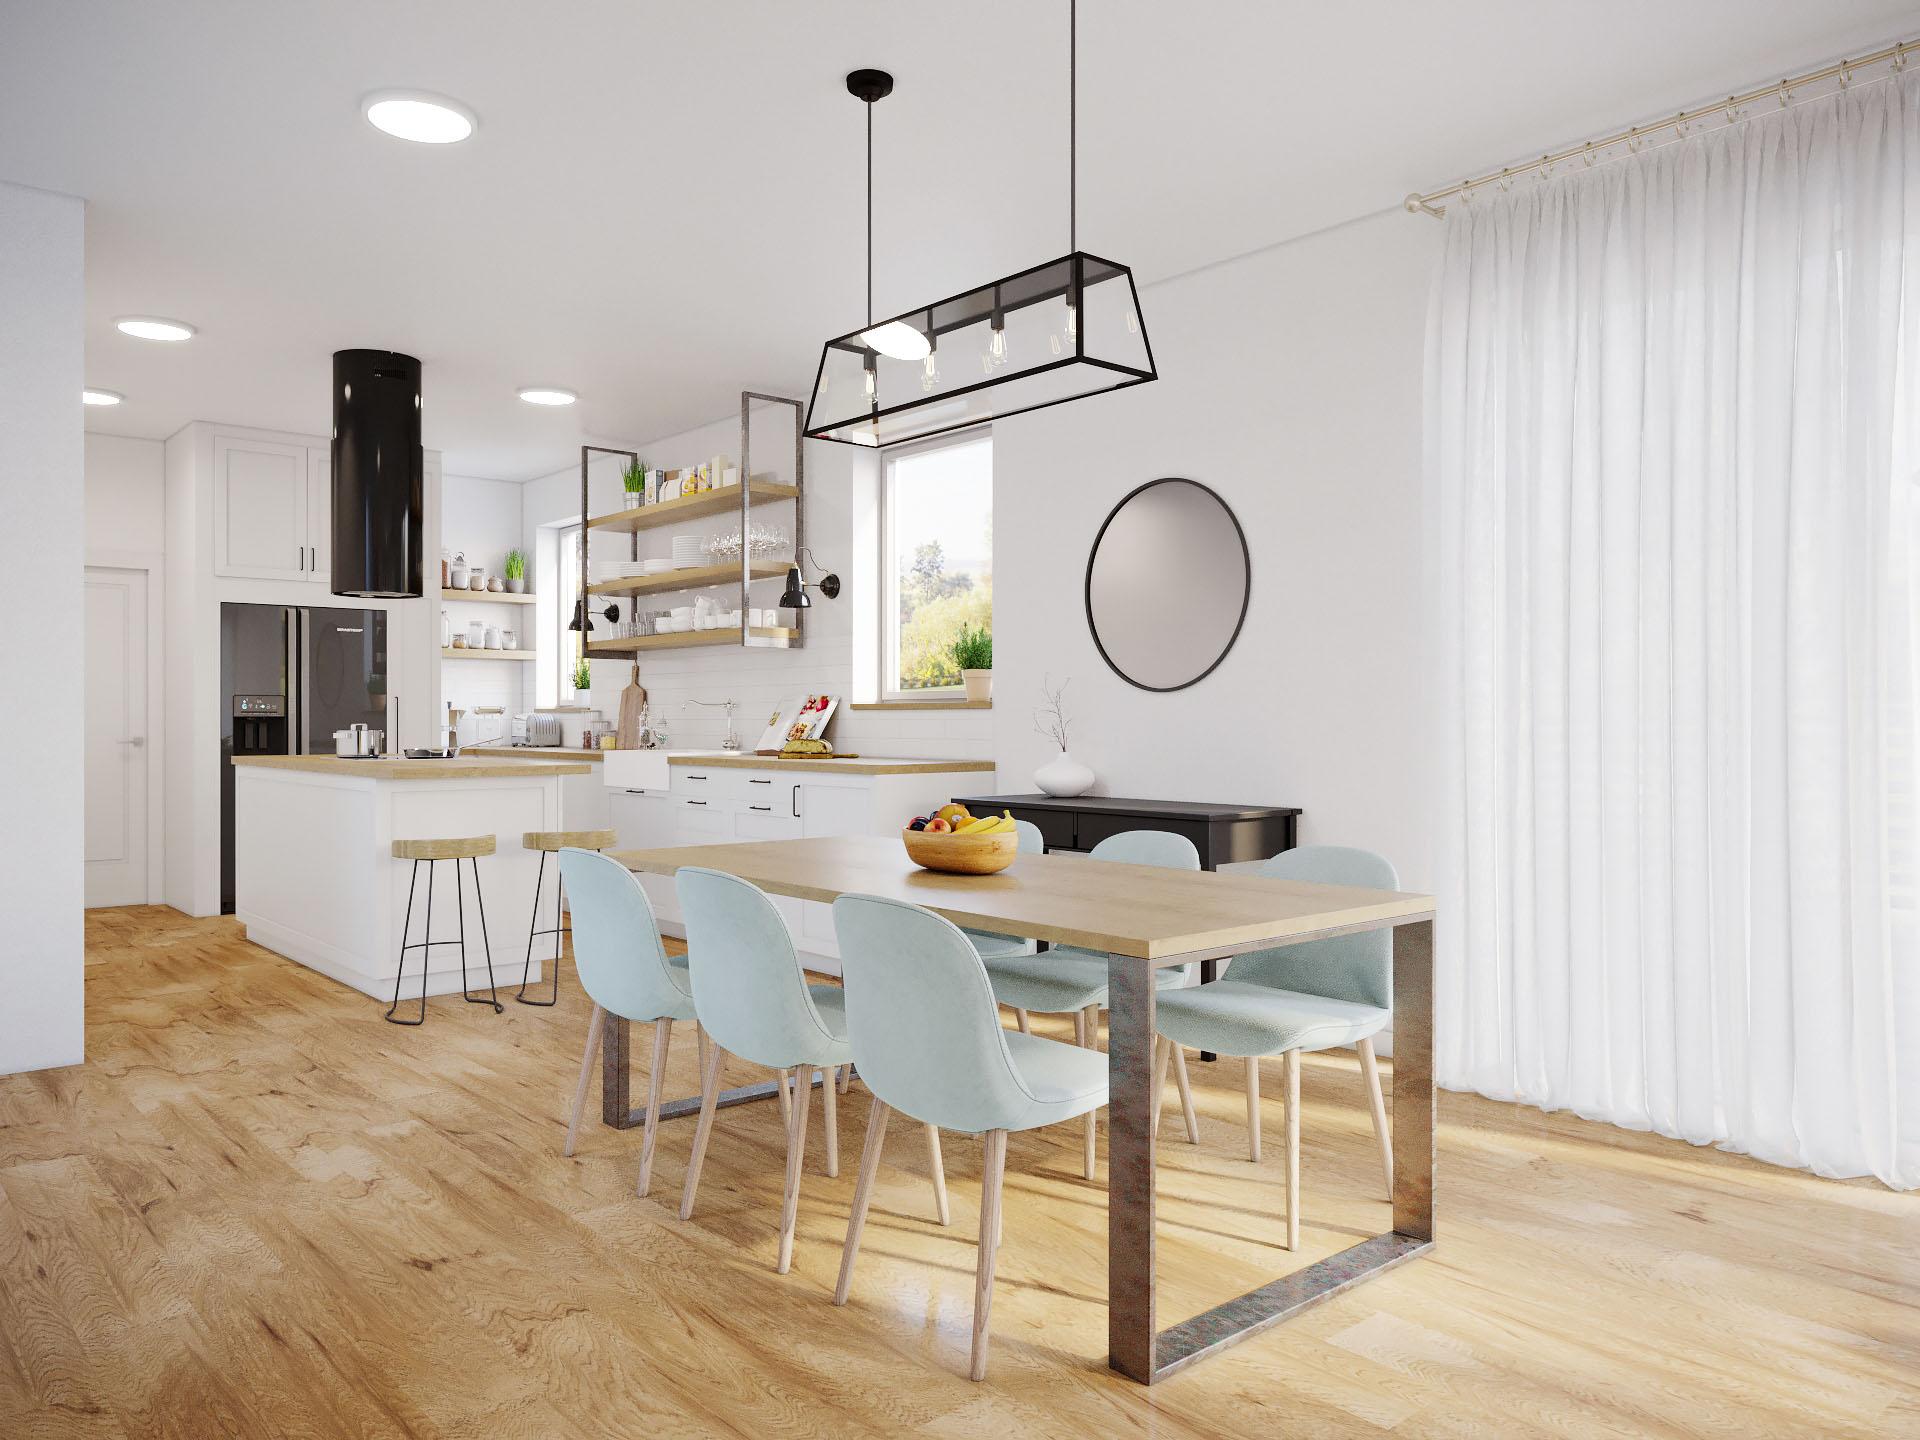 HOME SWEET HOME - interior design